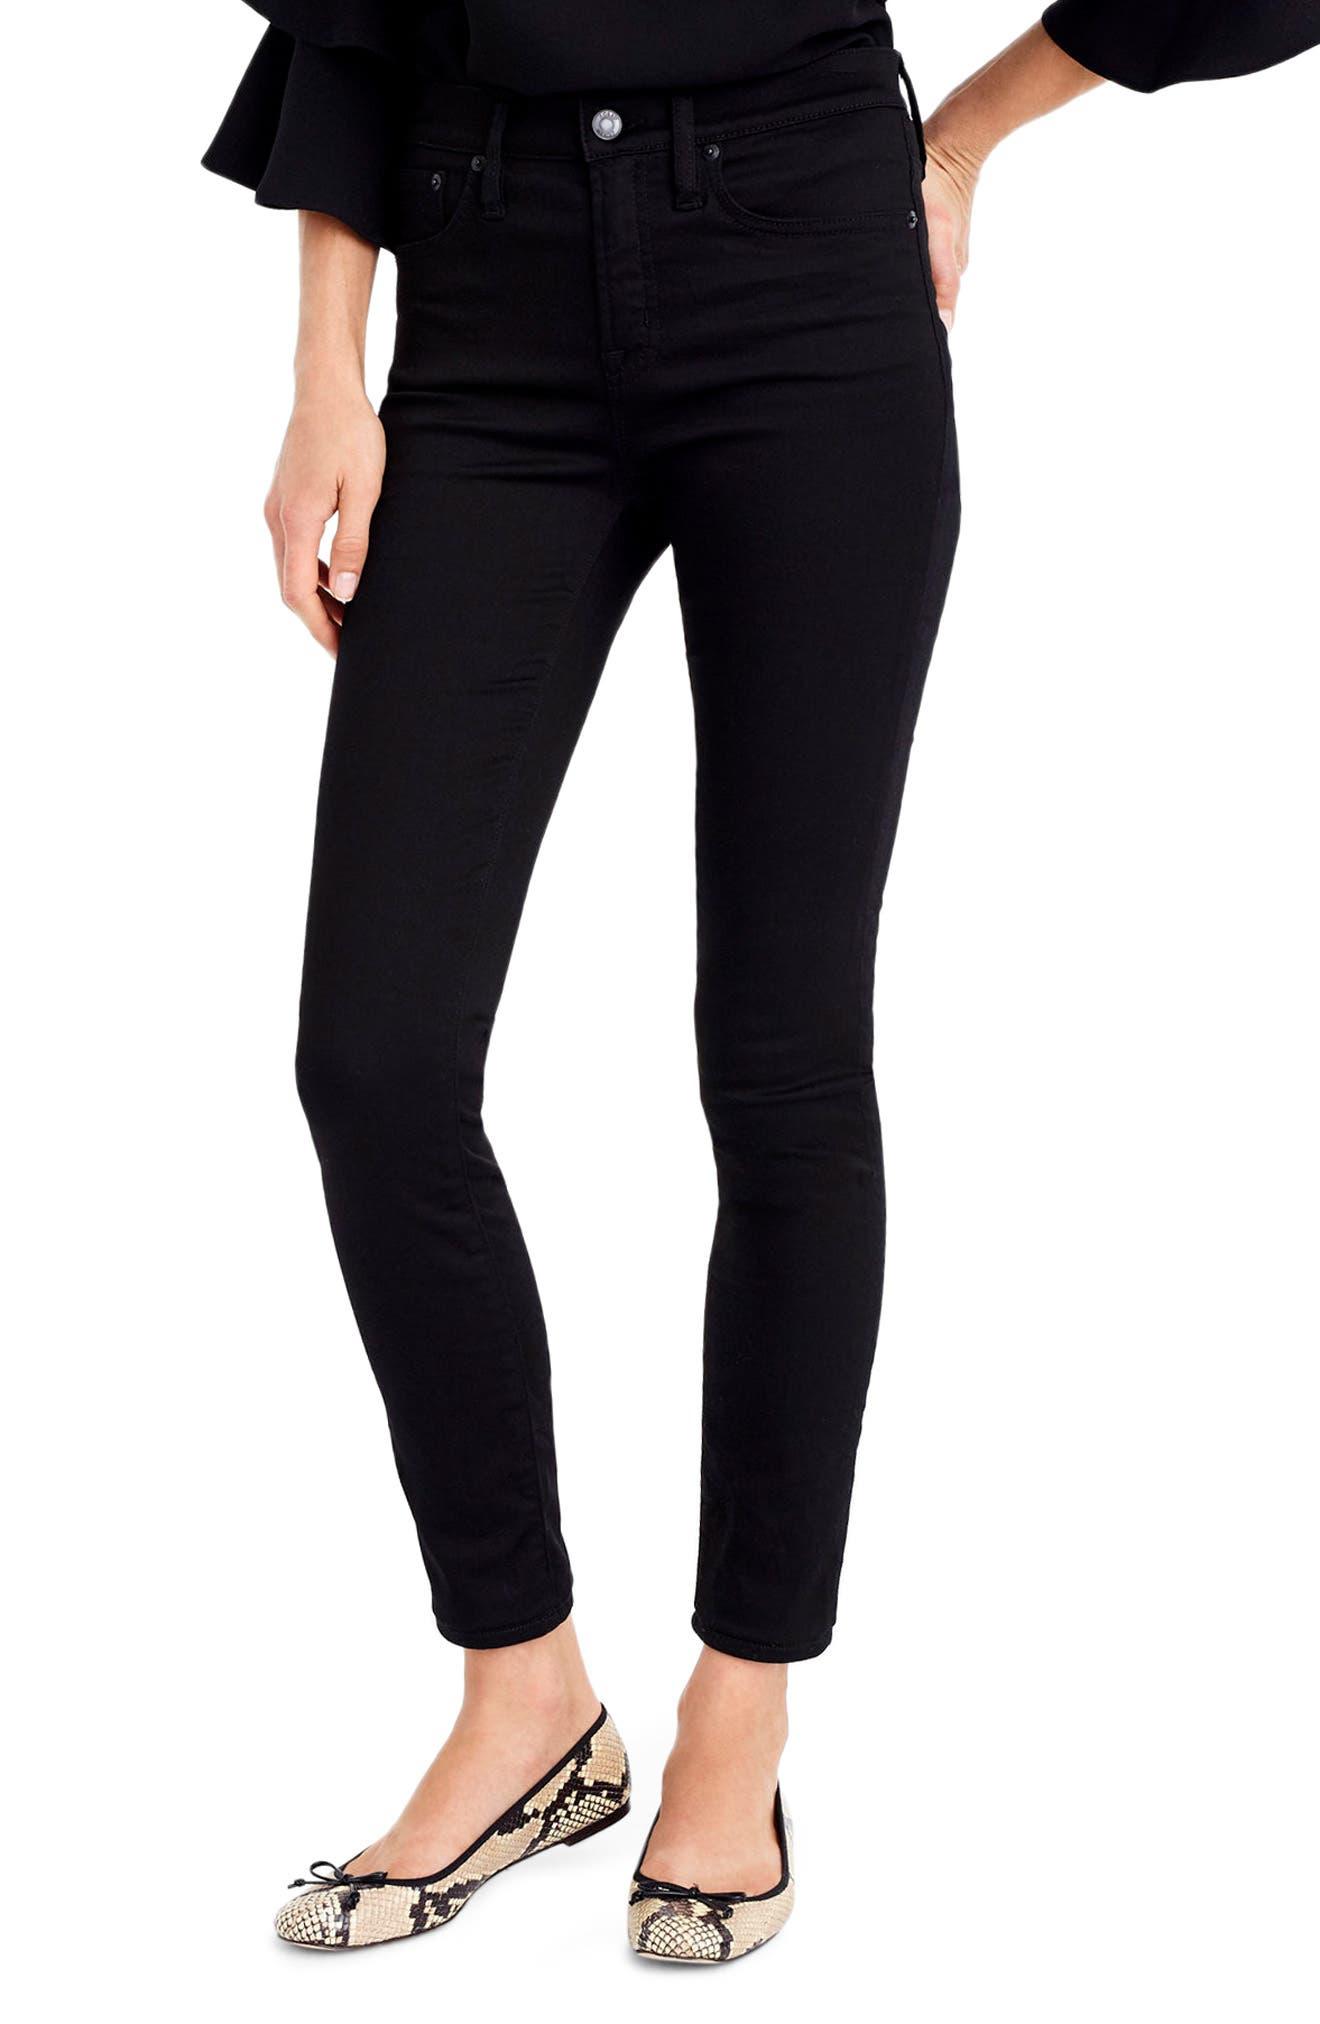 J.Crew Toothpick High Rise Jeans,                         Main,                         color, True Black